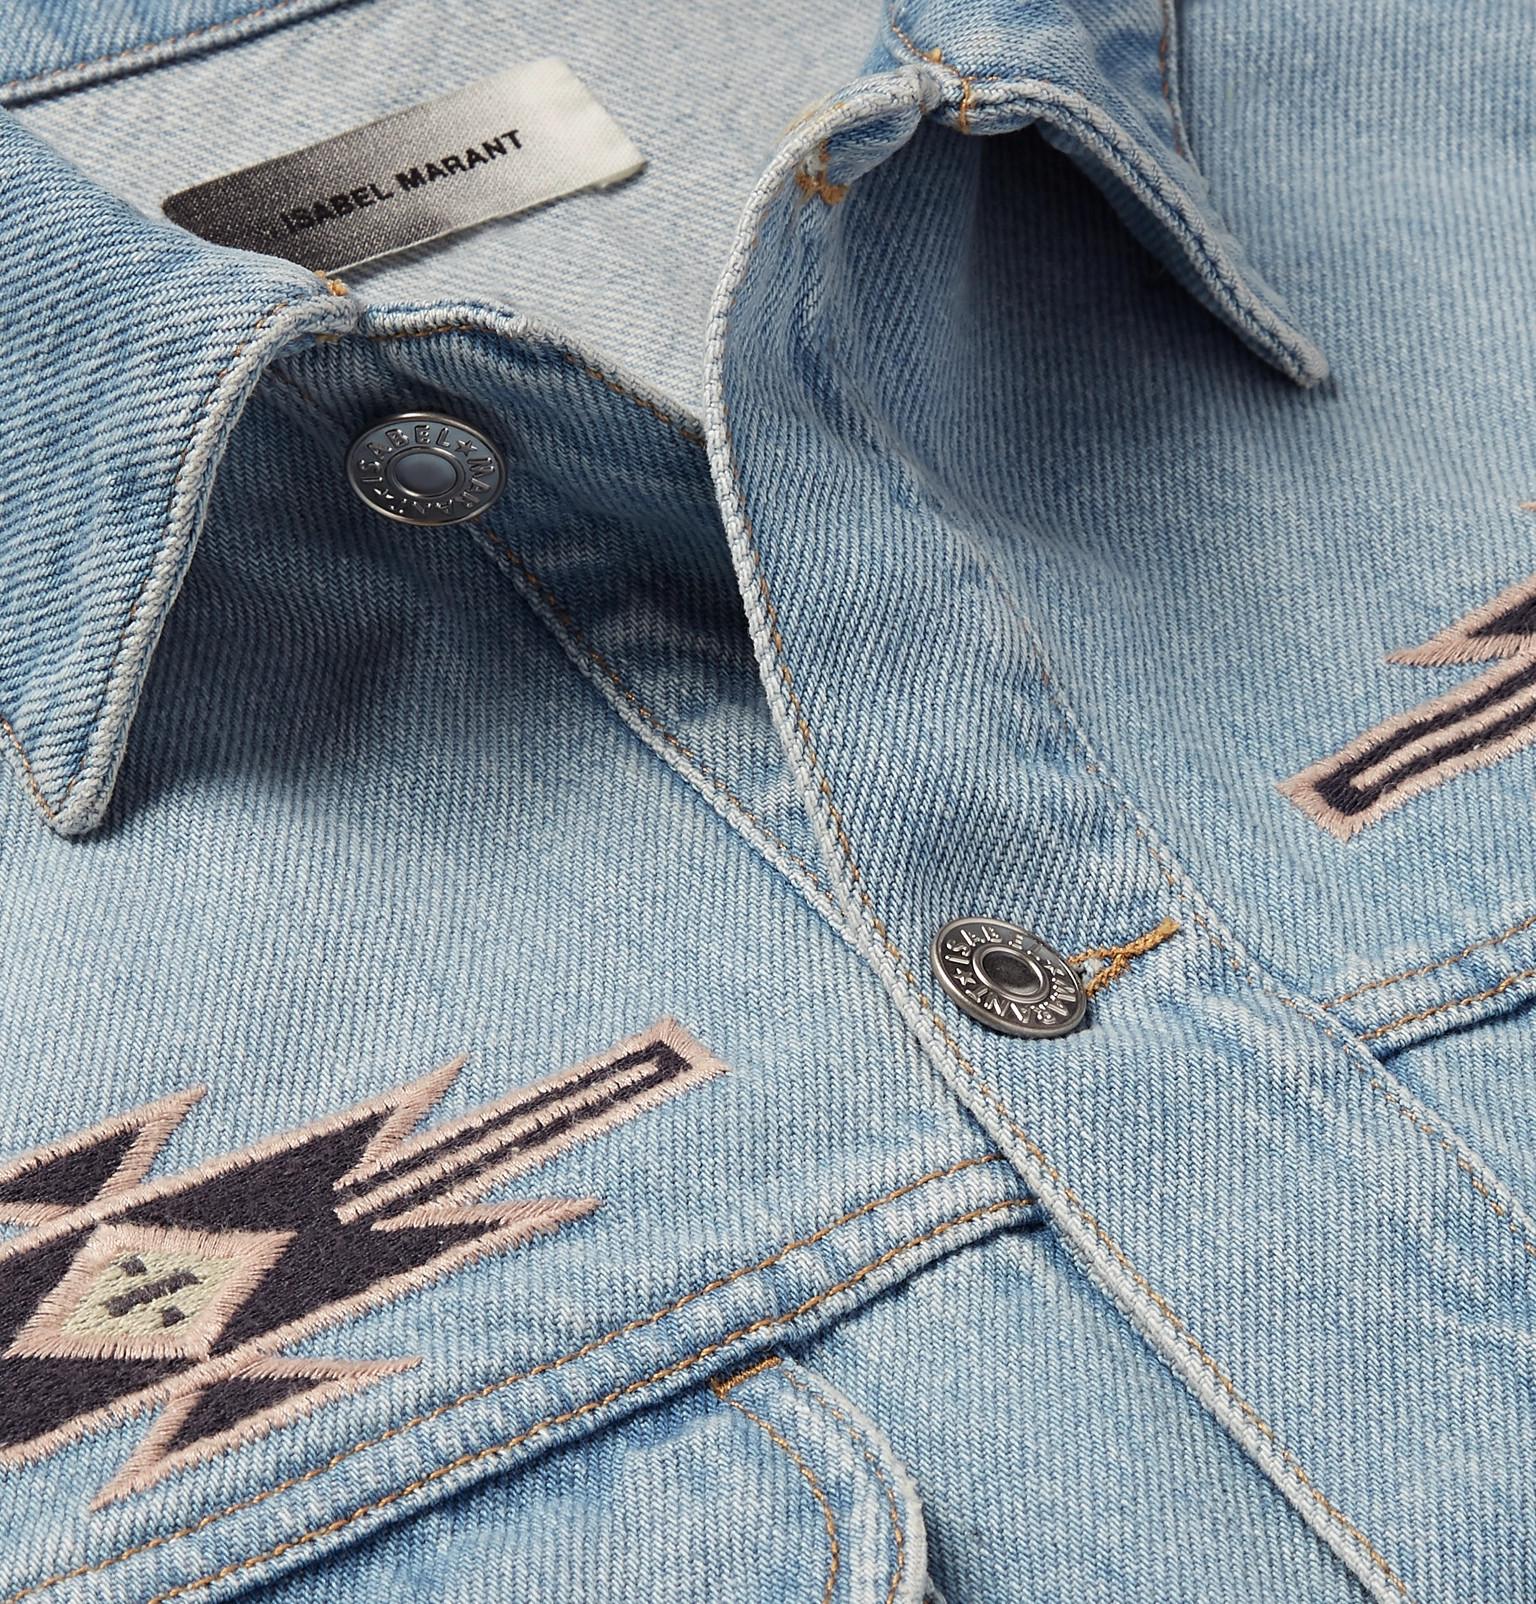 133a0dfd217 Isabel Marant - Jango Embroidered Denim Jacket